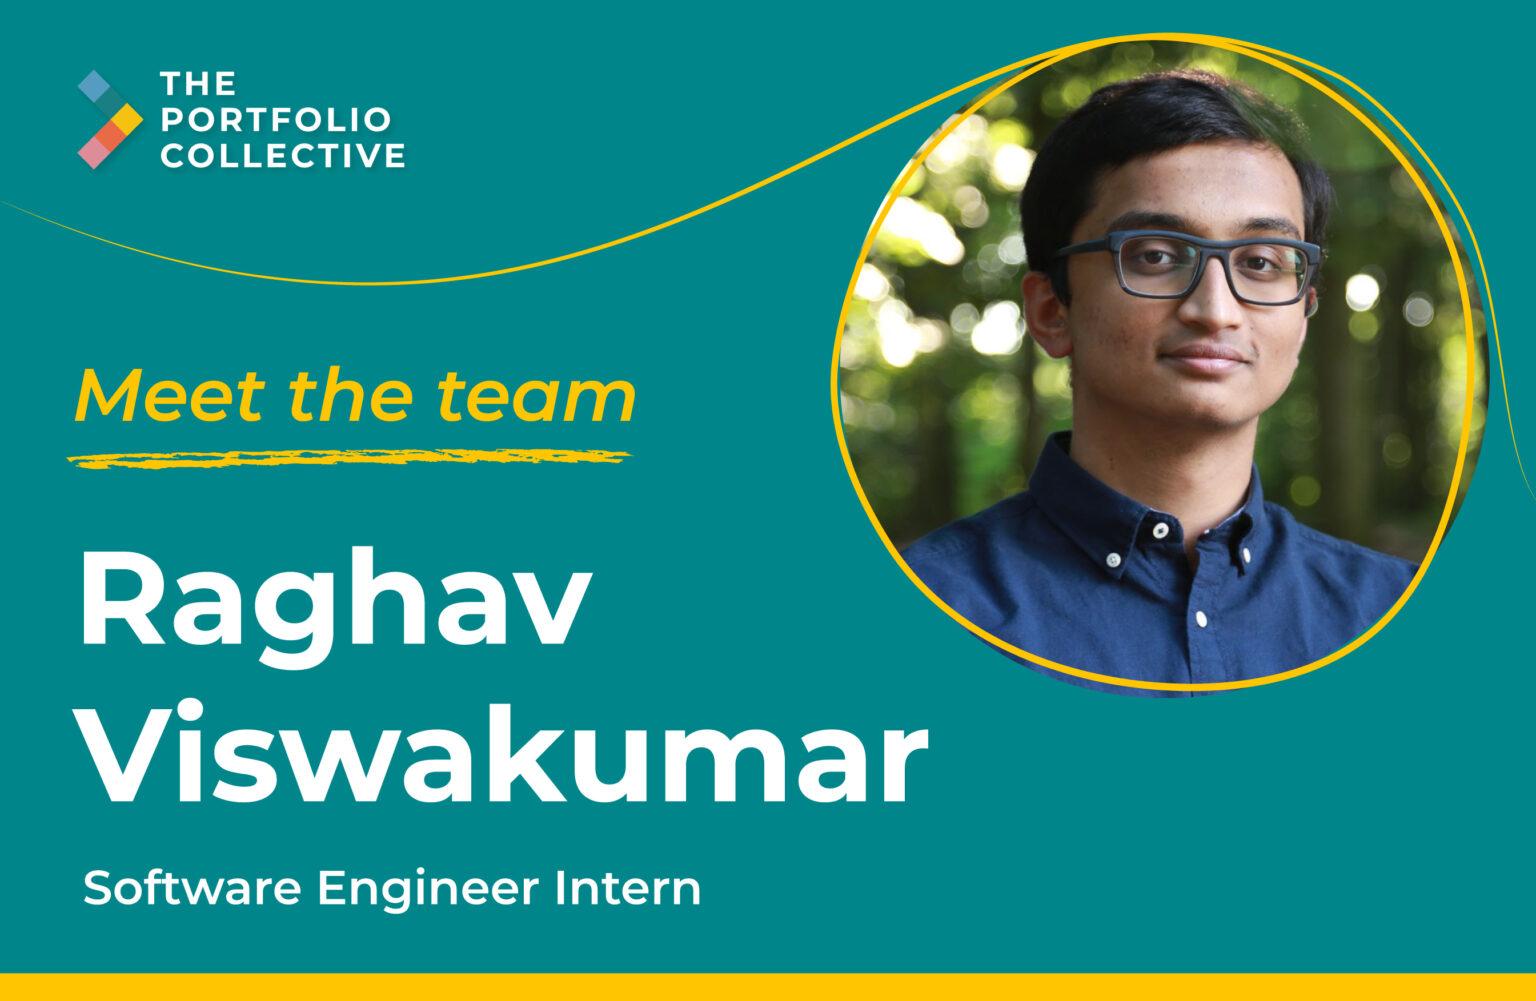 Meet-the-team-Raghav